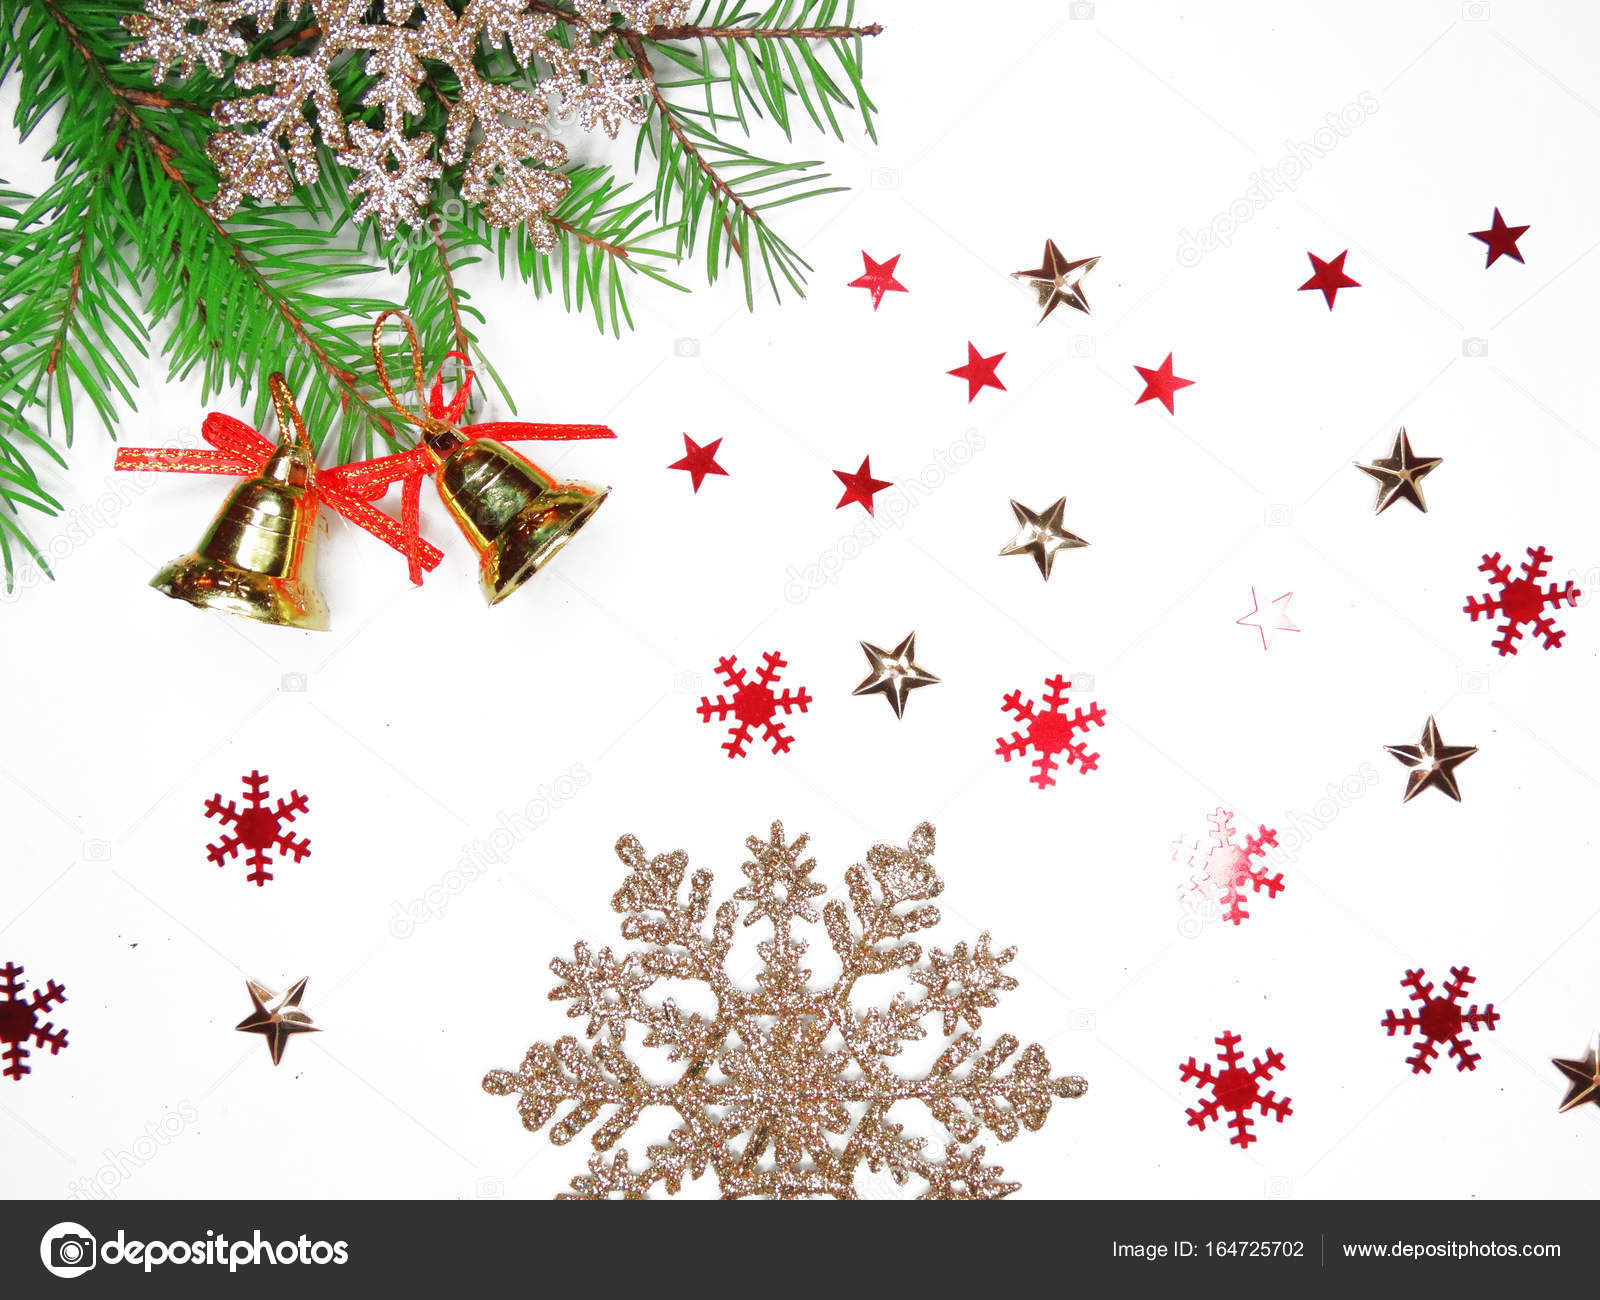 Kerst decoratie compositie bij spar takken garland licht — Stockfoto ...